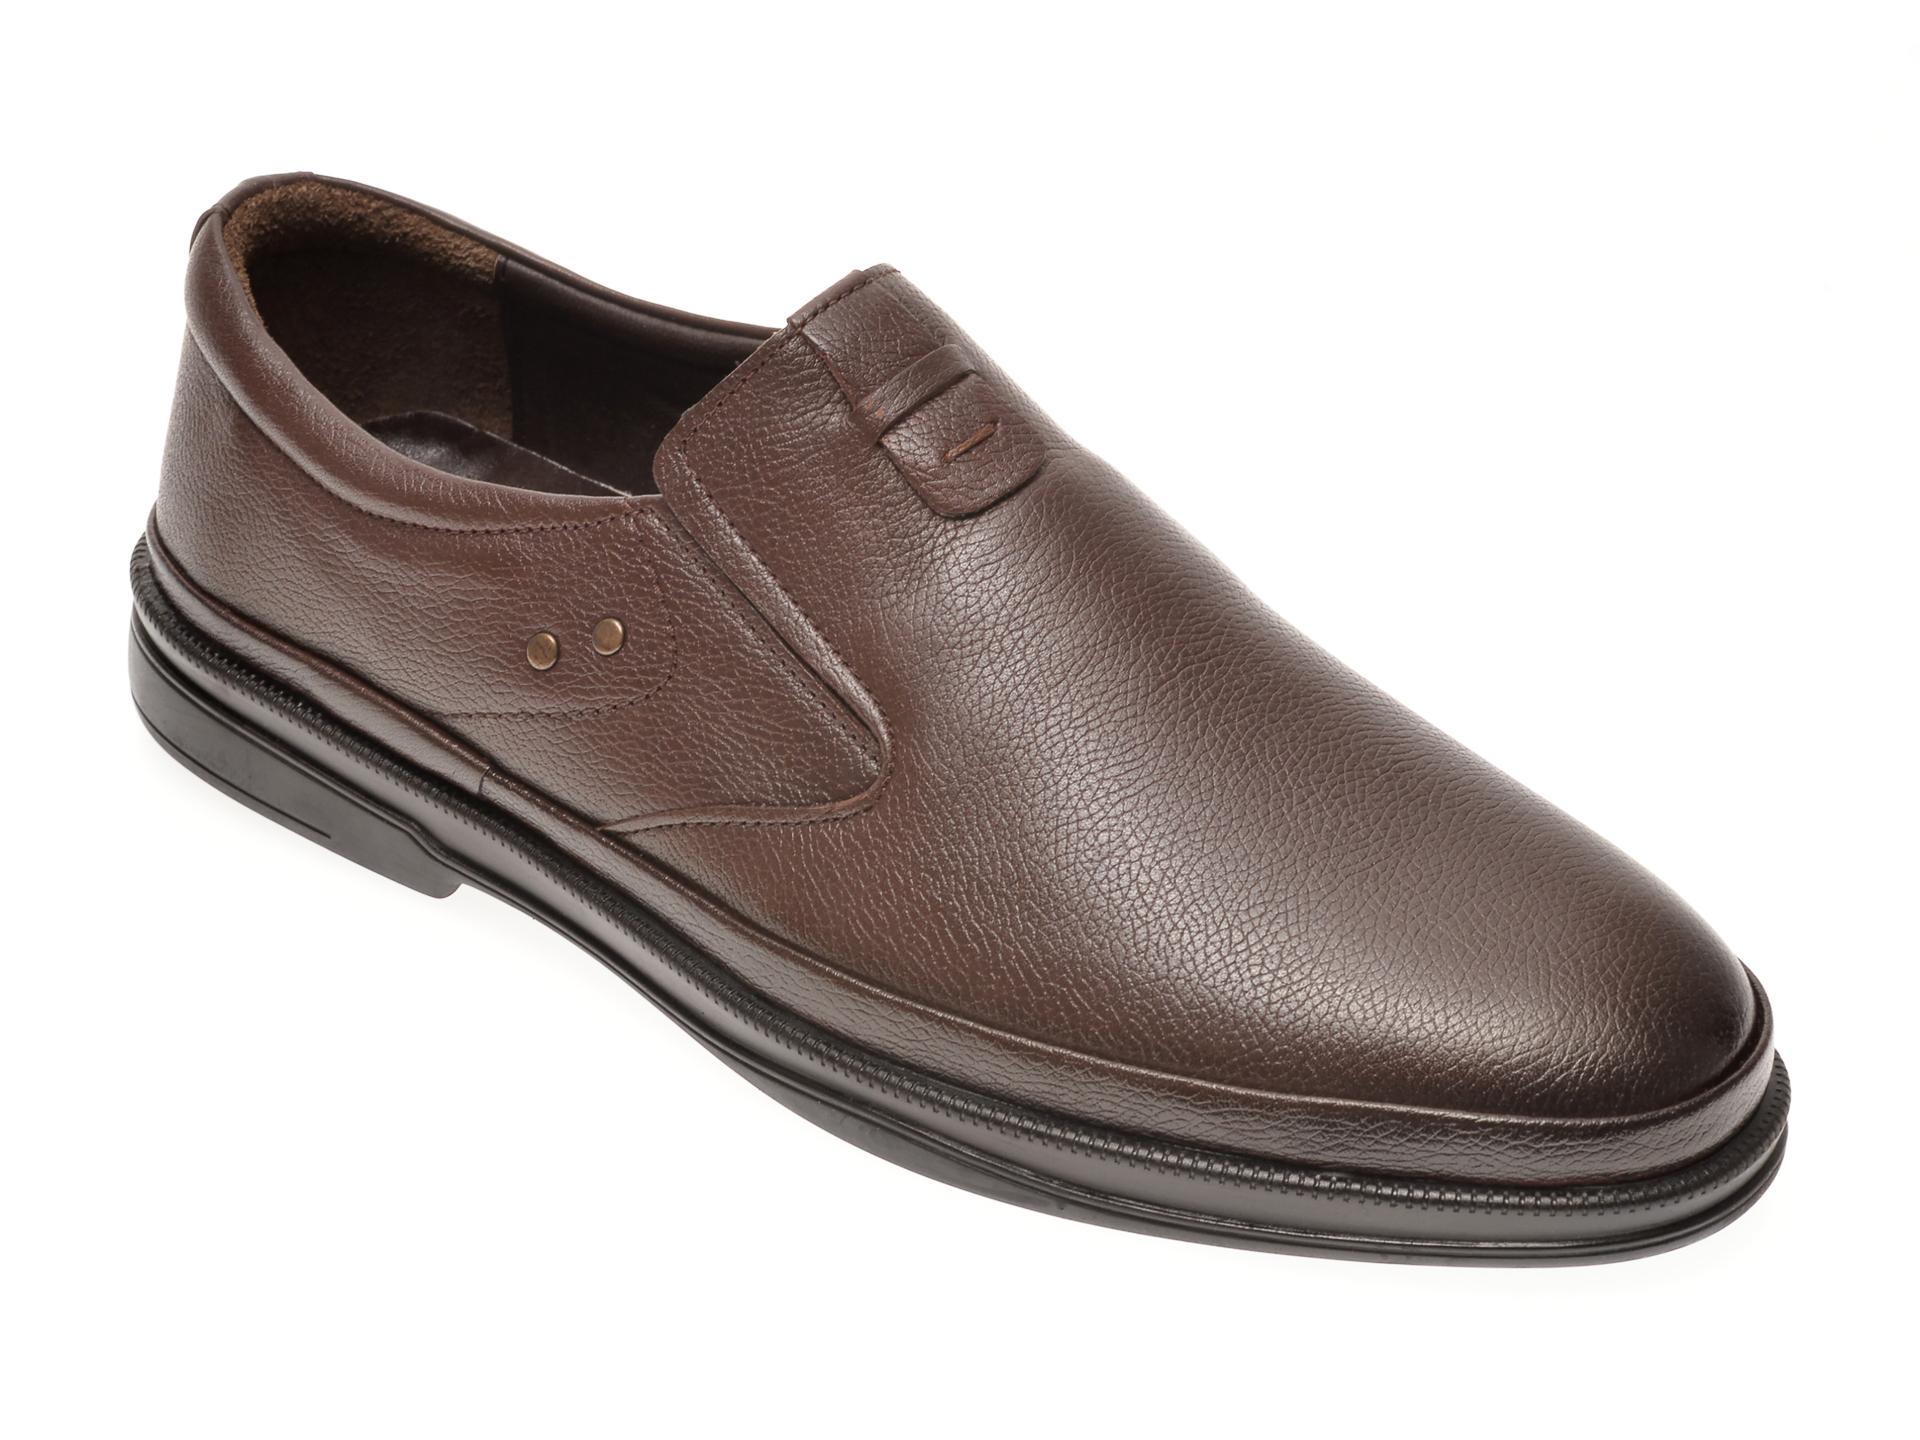 Pantofi OTTER maro, 66401, din piele naturala imagine otter.ro